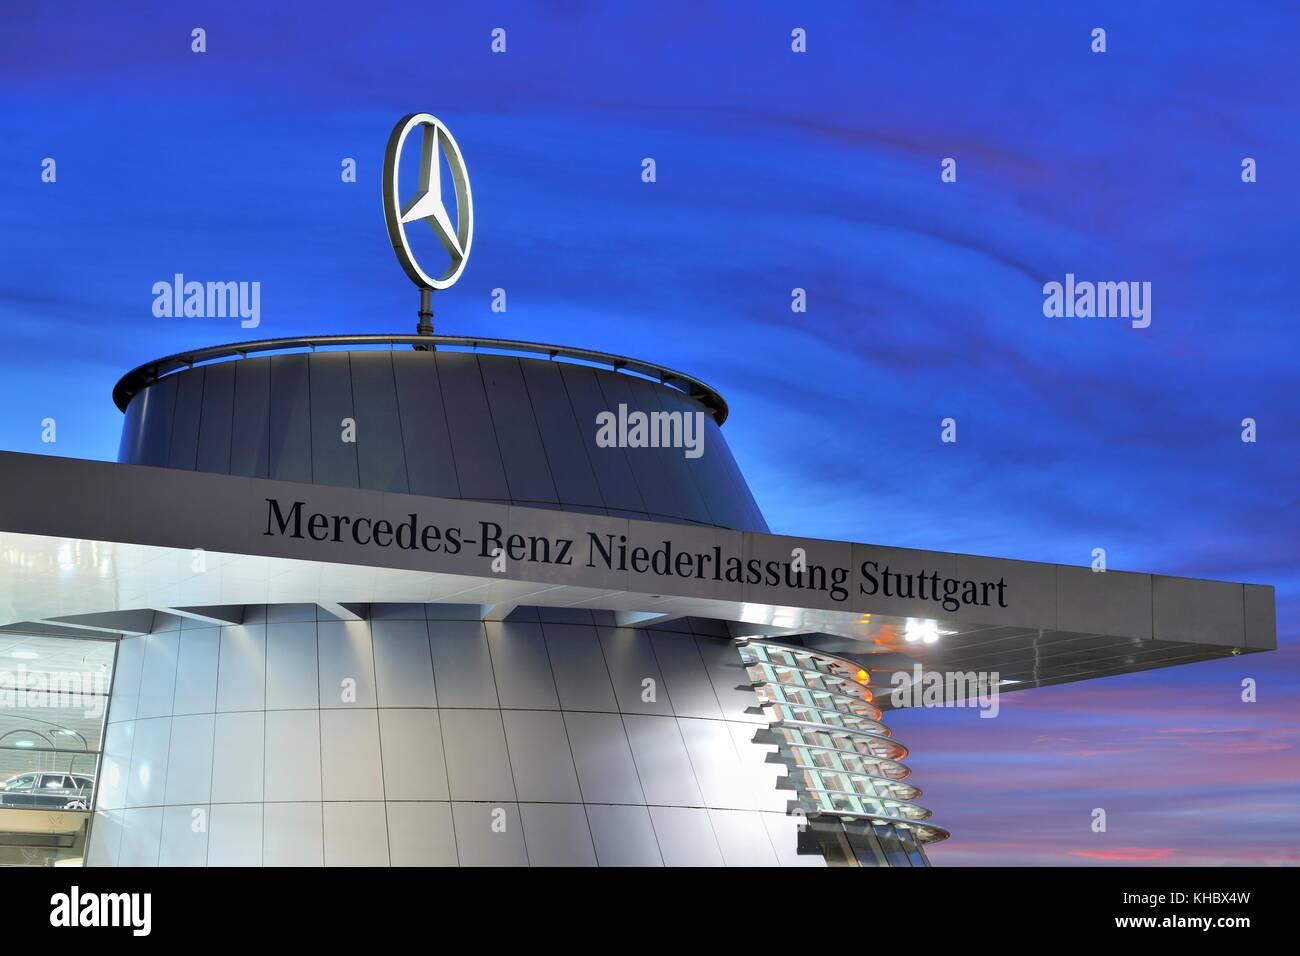 Mercedes Benz branch Stuttgart, Baden-Württemberg, Germany - Stock Image